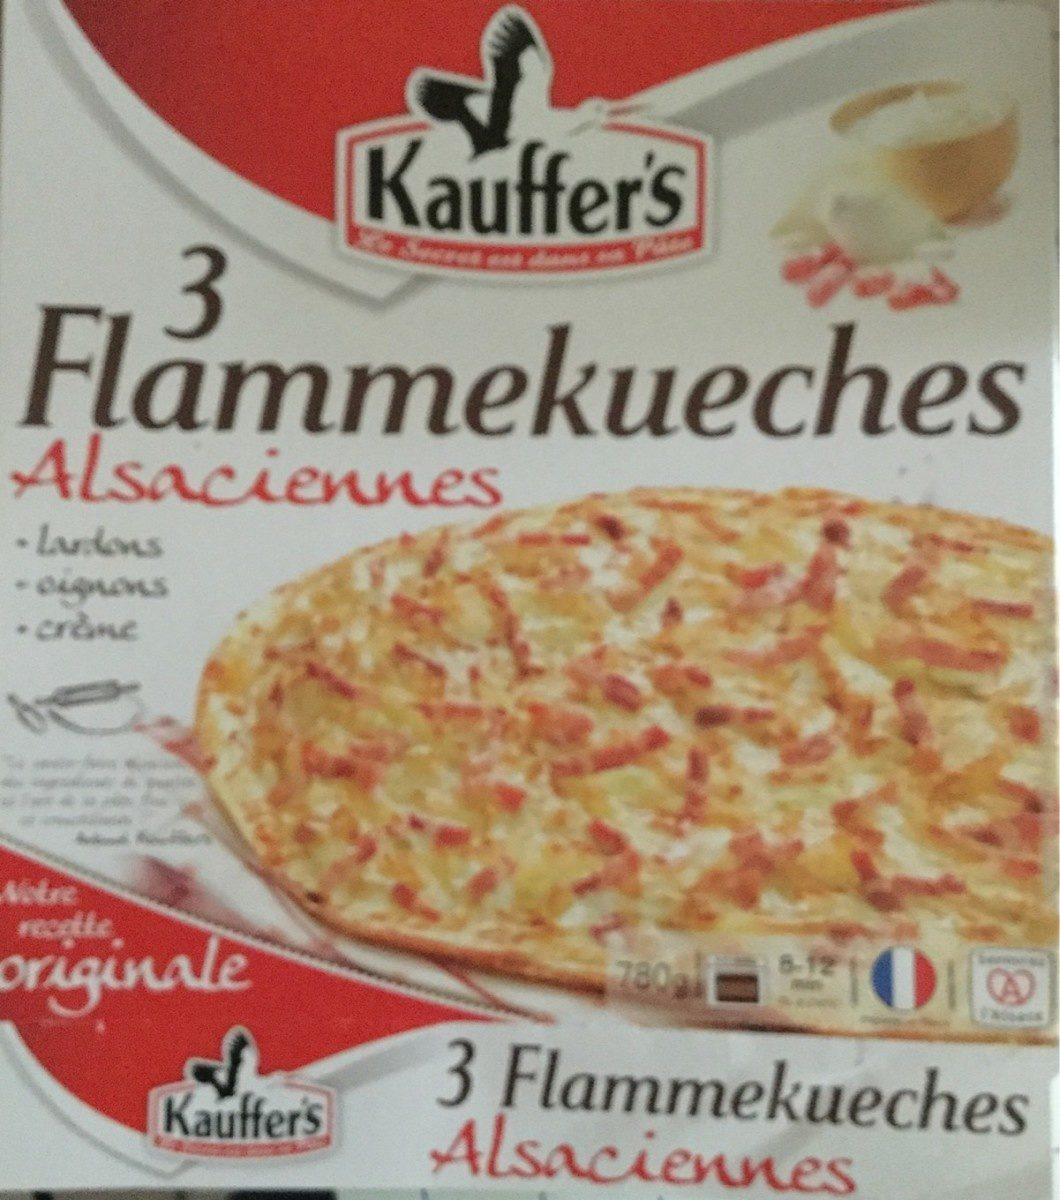 3 flammekueches alsaciennes - Produit - fr